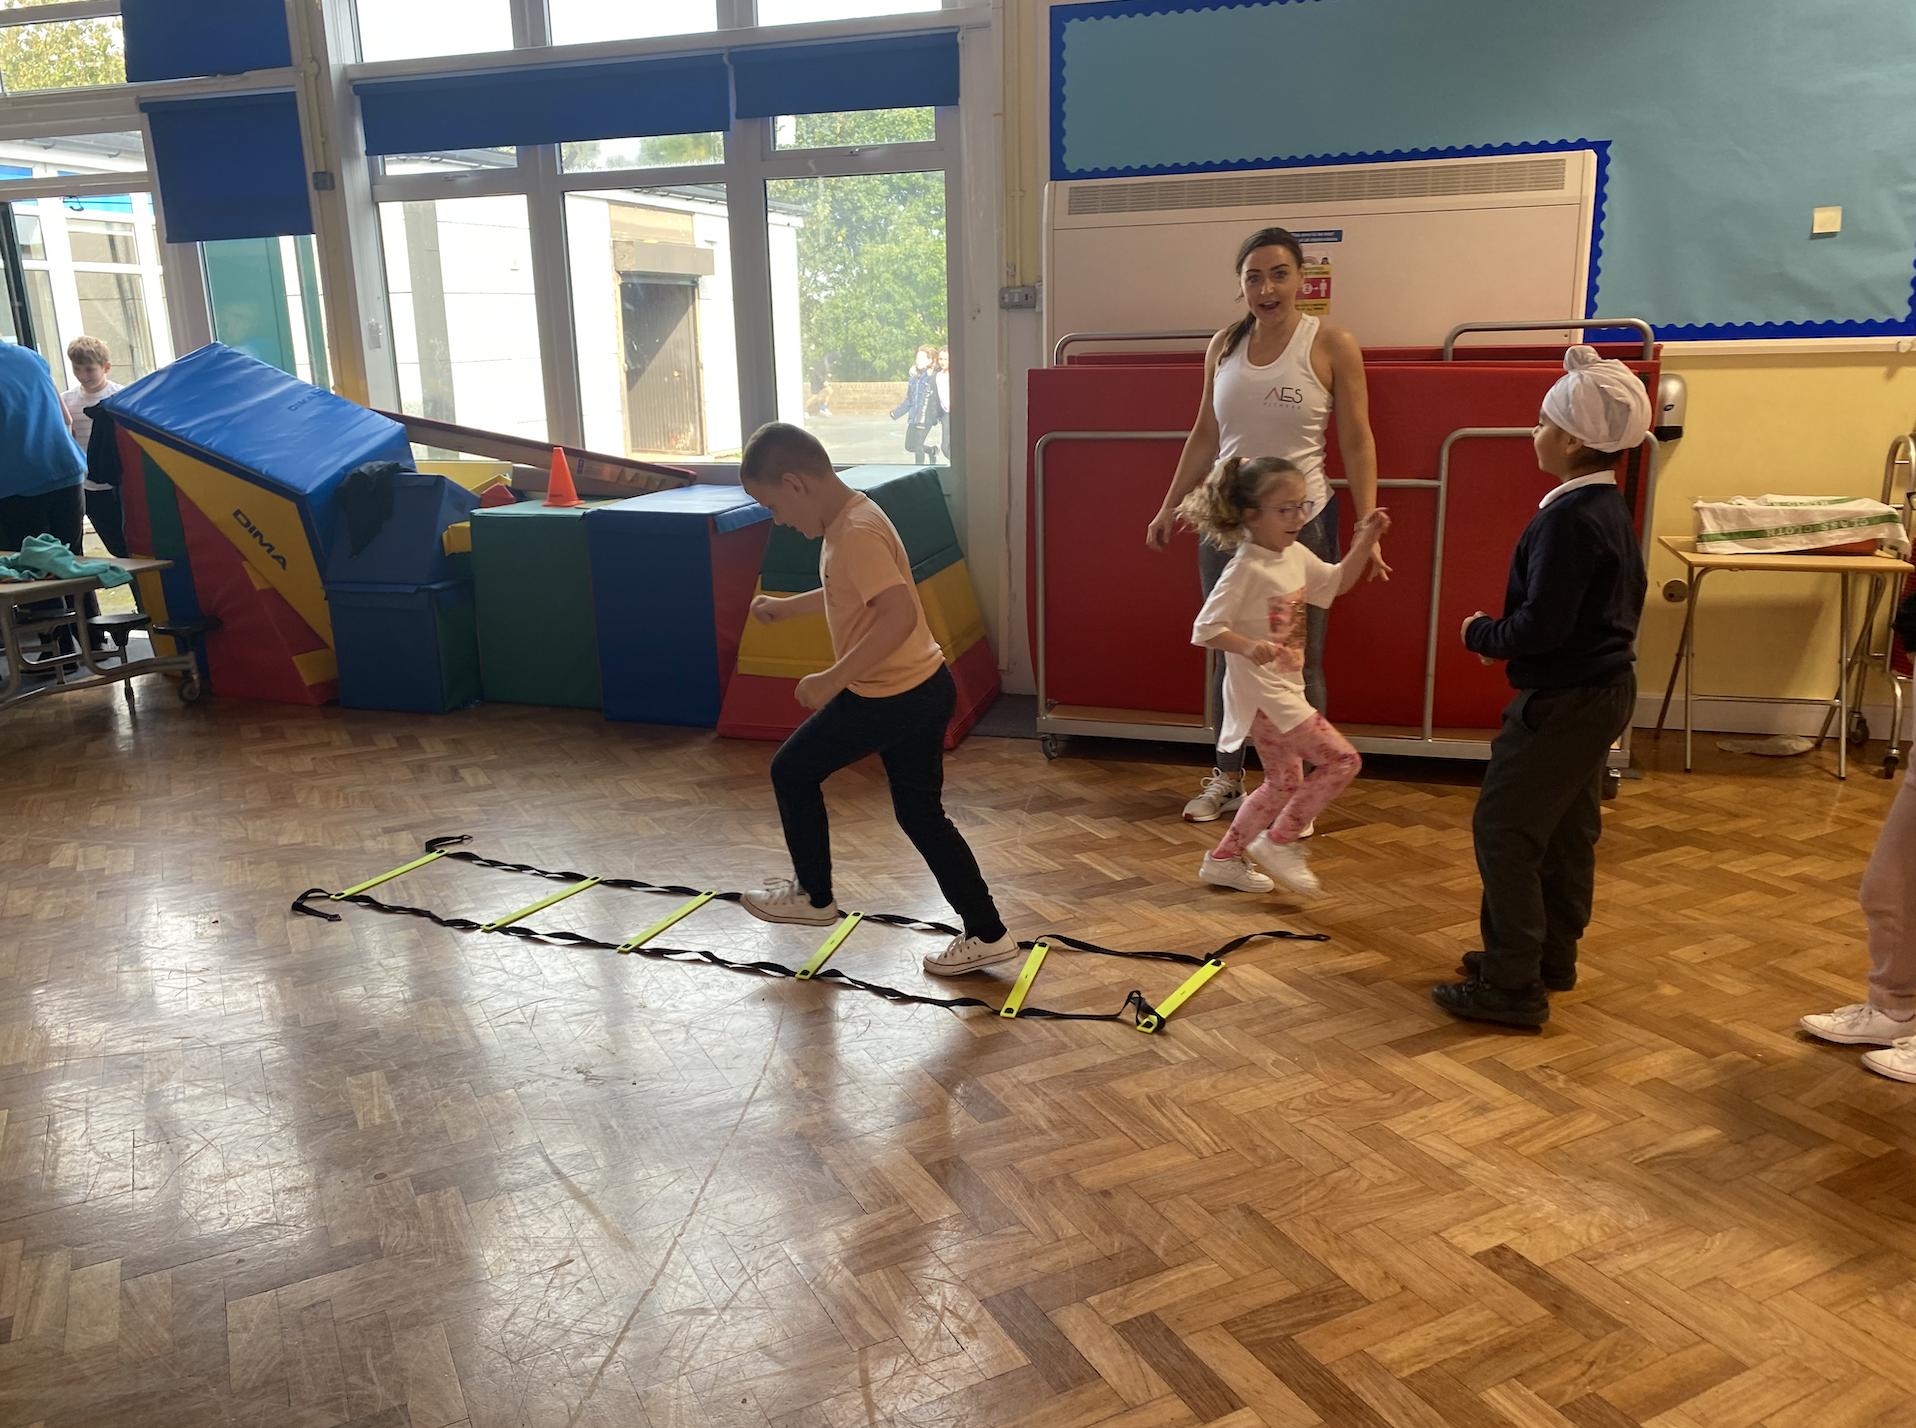 Year 3 children enjoying their PT session